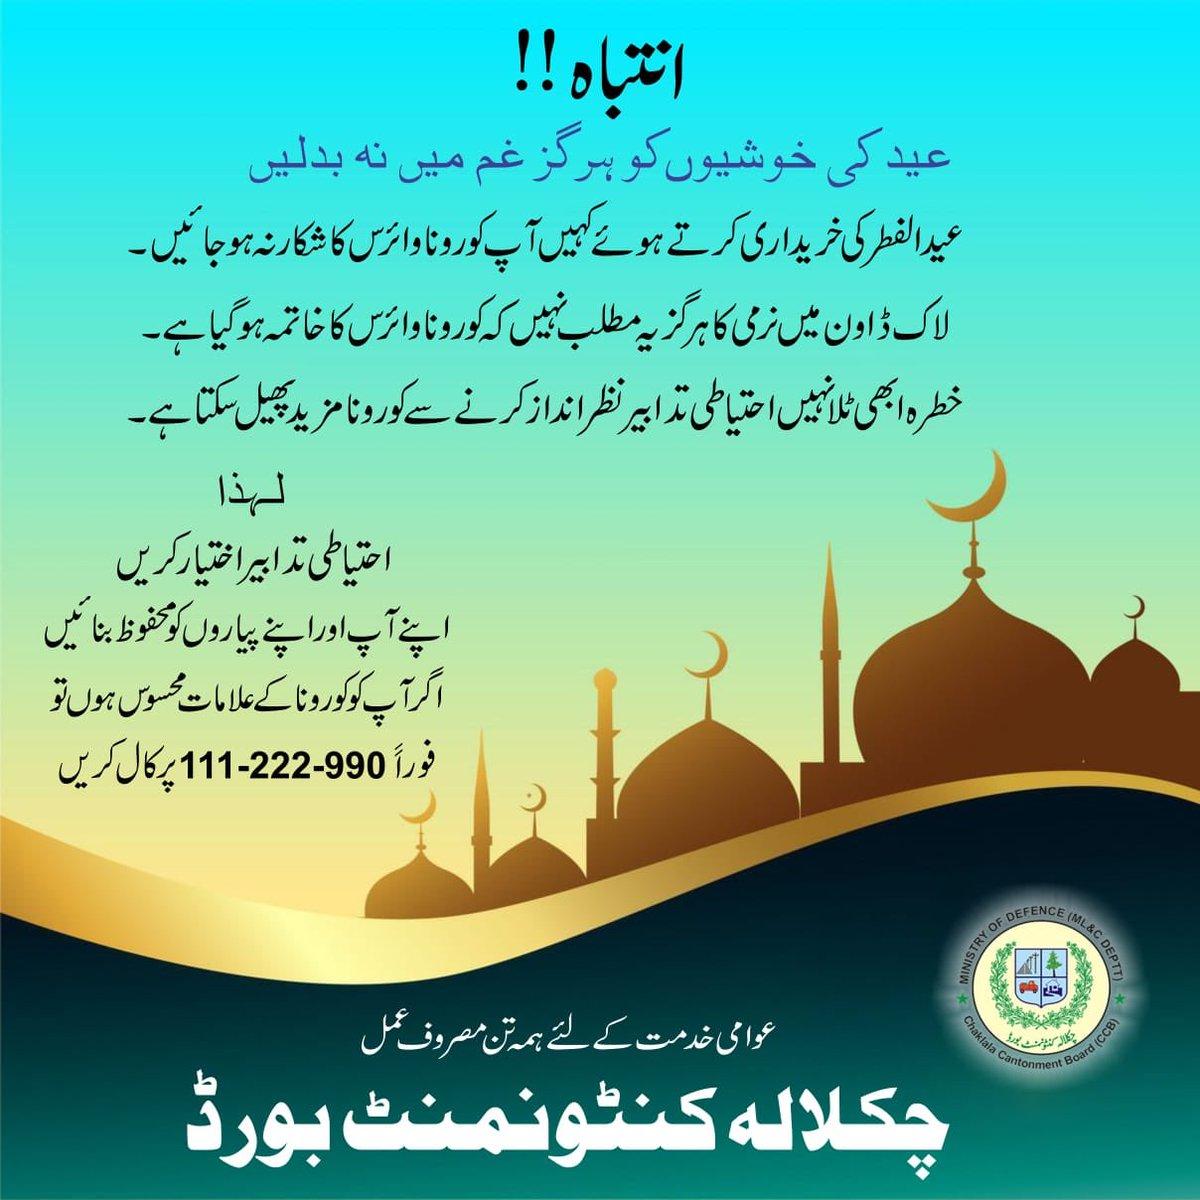 Please Stay Alert & Take Preventive Measures  Chaklala At Your Service  #CBCARE #CCB #Chaklala #Rawalpindi #Rawalpindians #Covid19 #CoronainPakistan #Pakistanpic.twitter.com/KvZZubhzU1